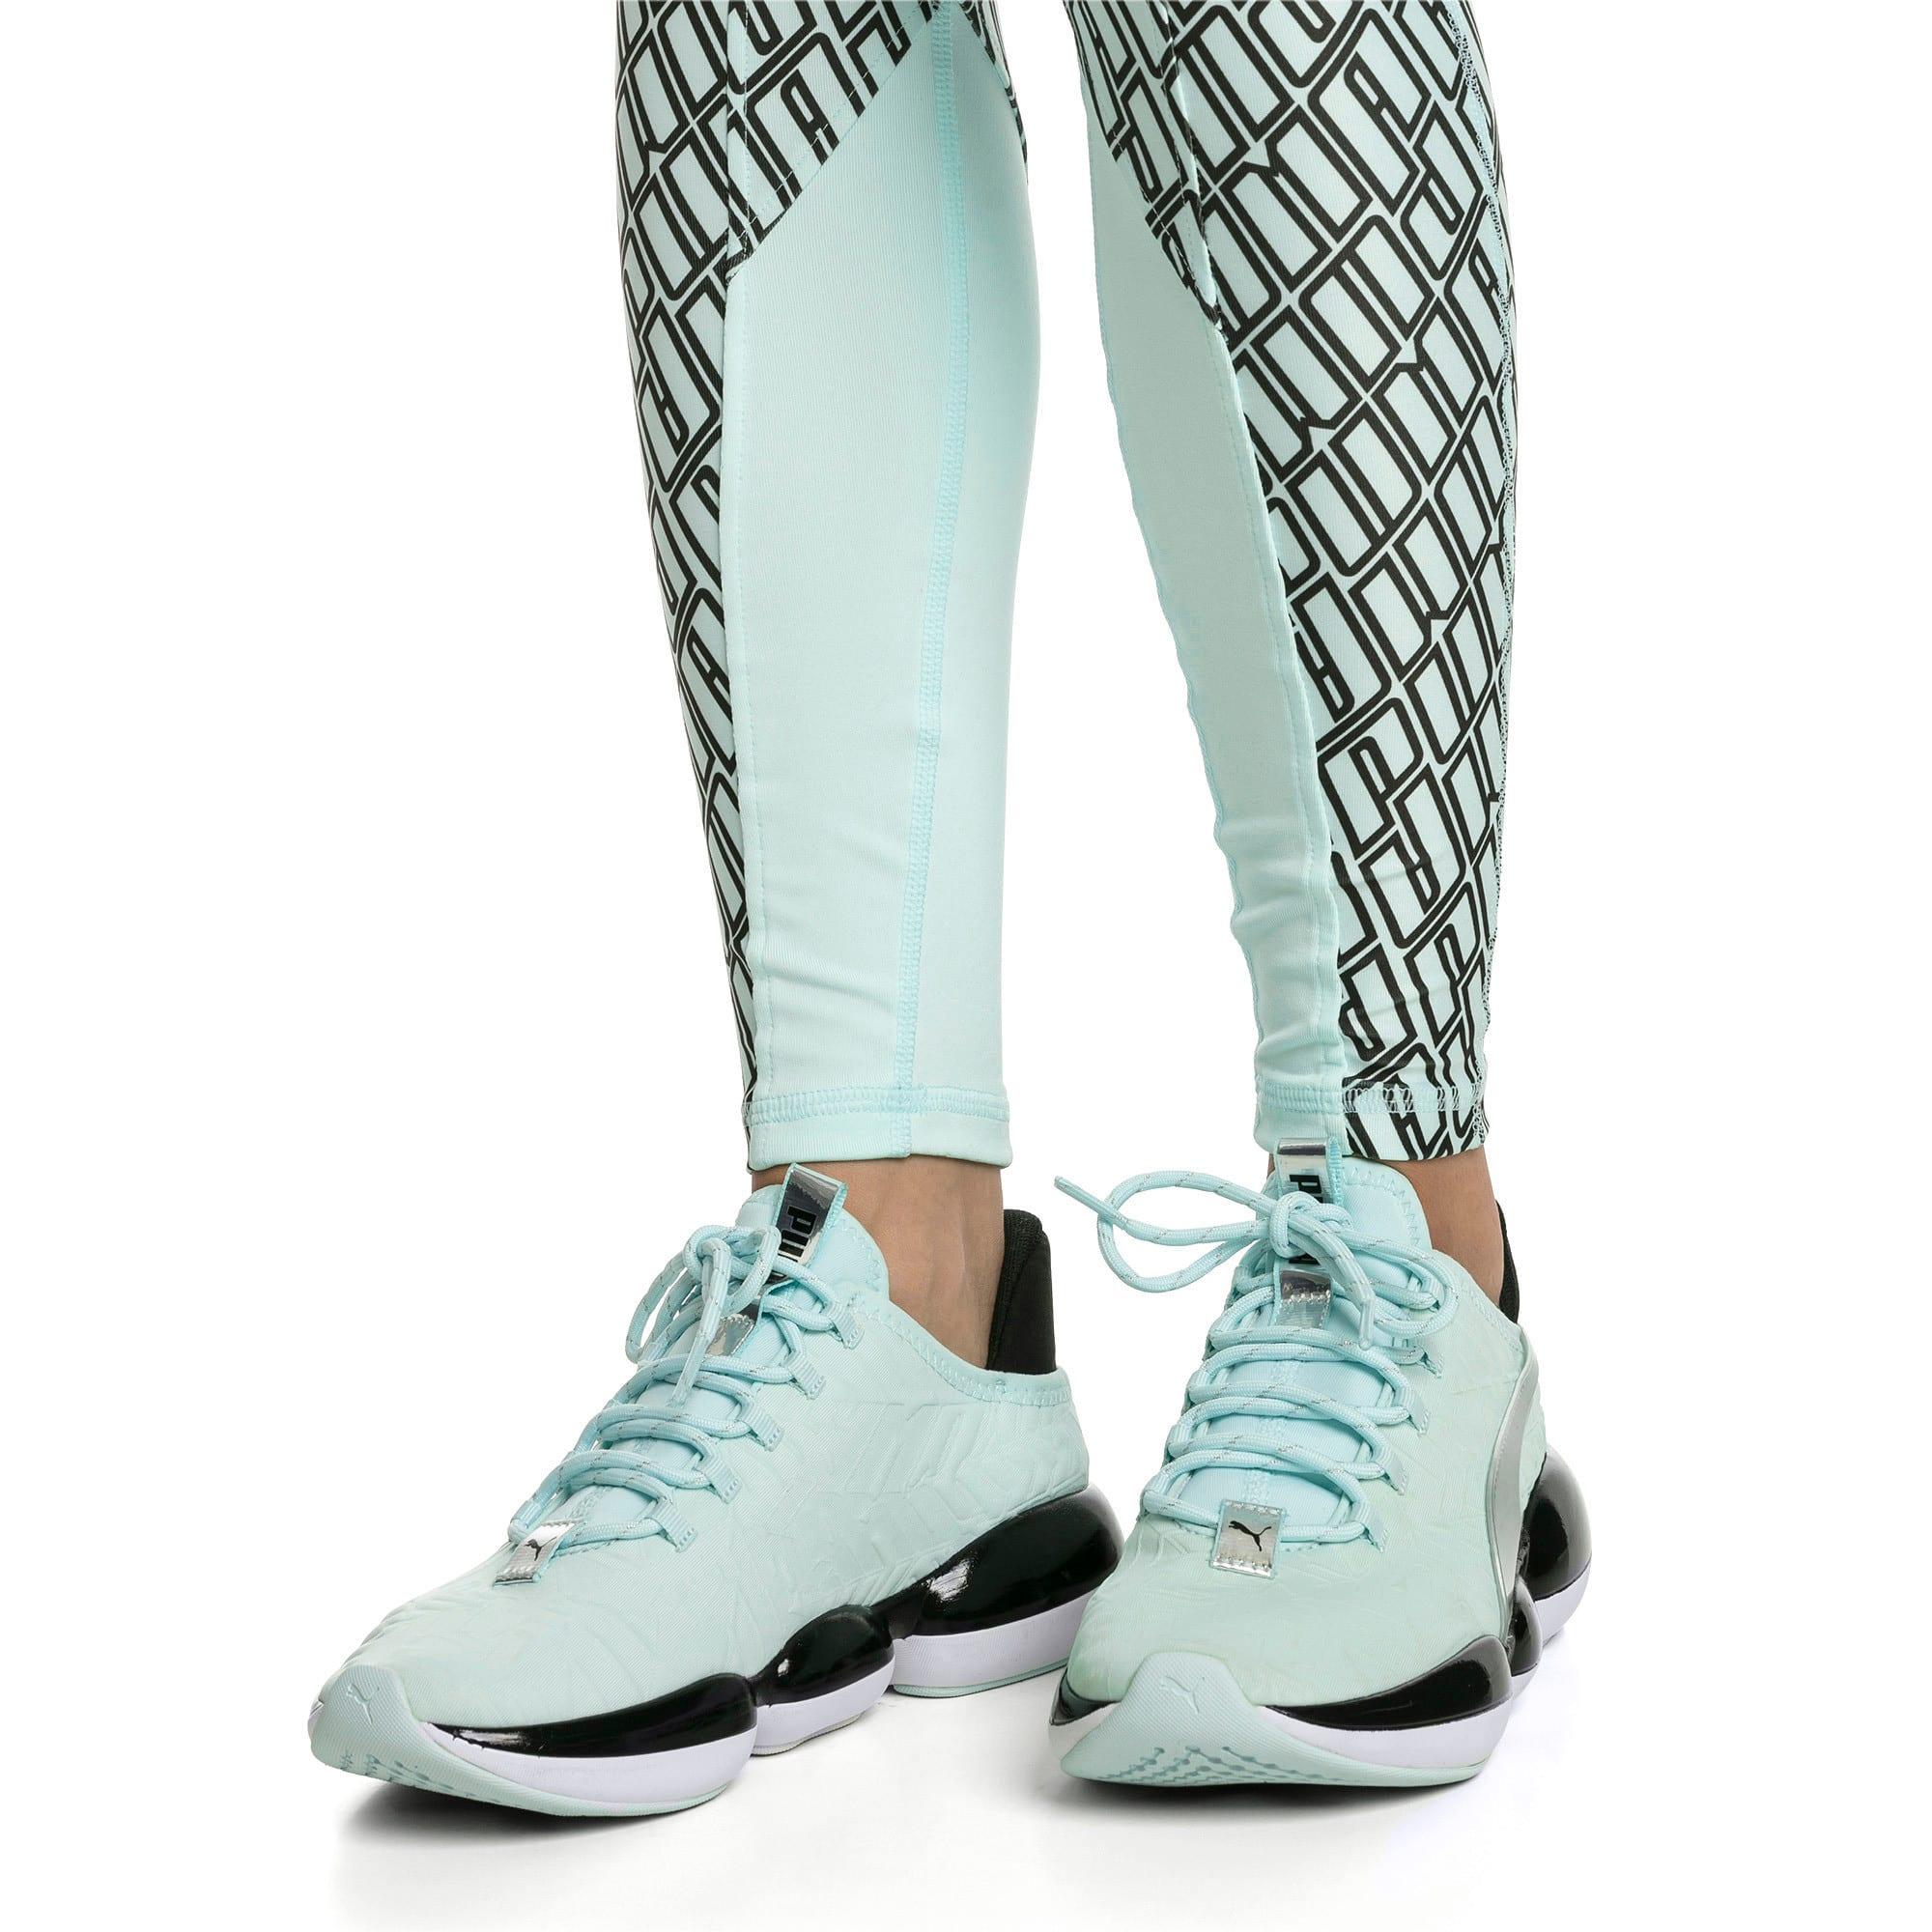 Thumbnail 2 of Mode XT Trailblazer Women's Training Shoes, Fair Aqua-Puma White, medium